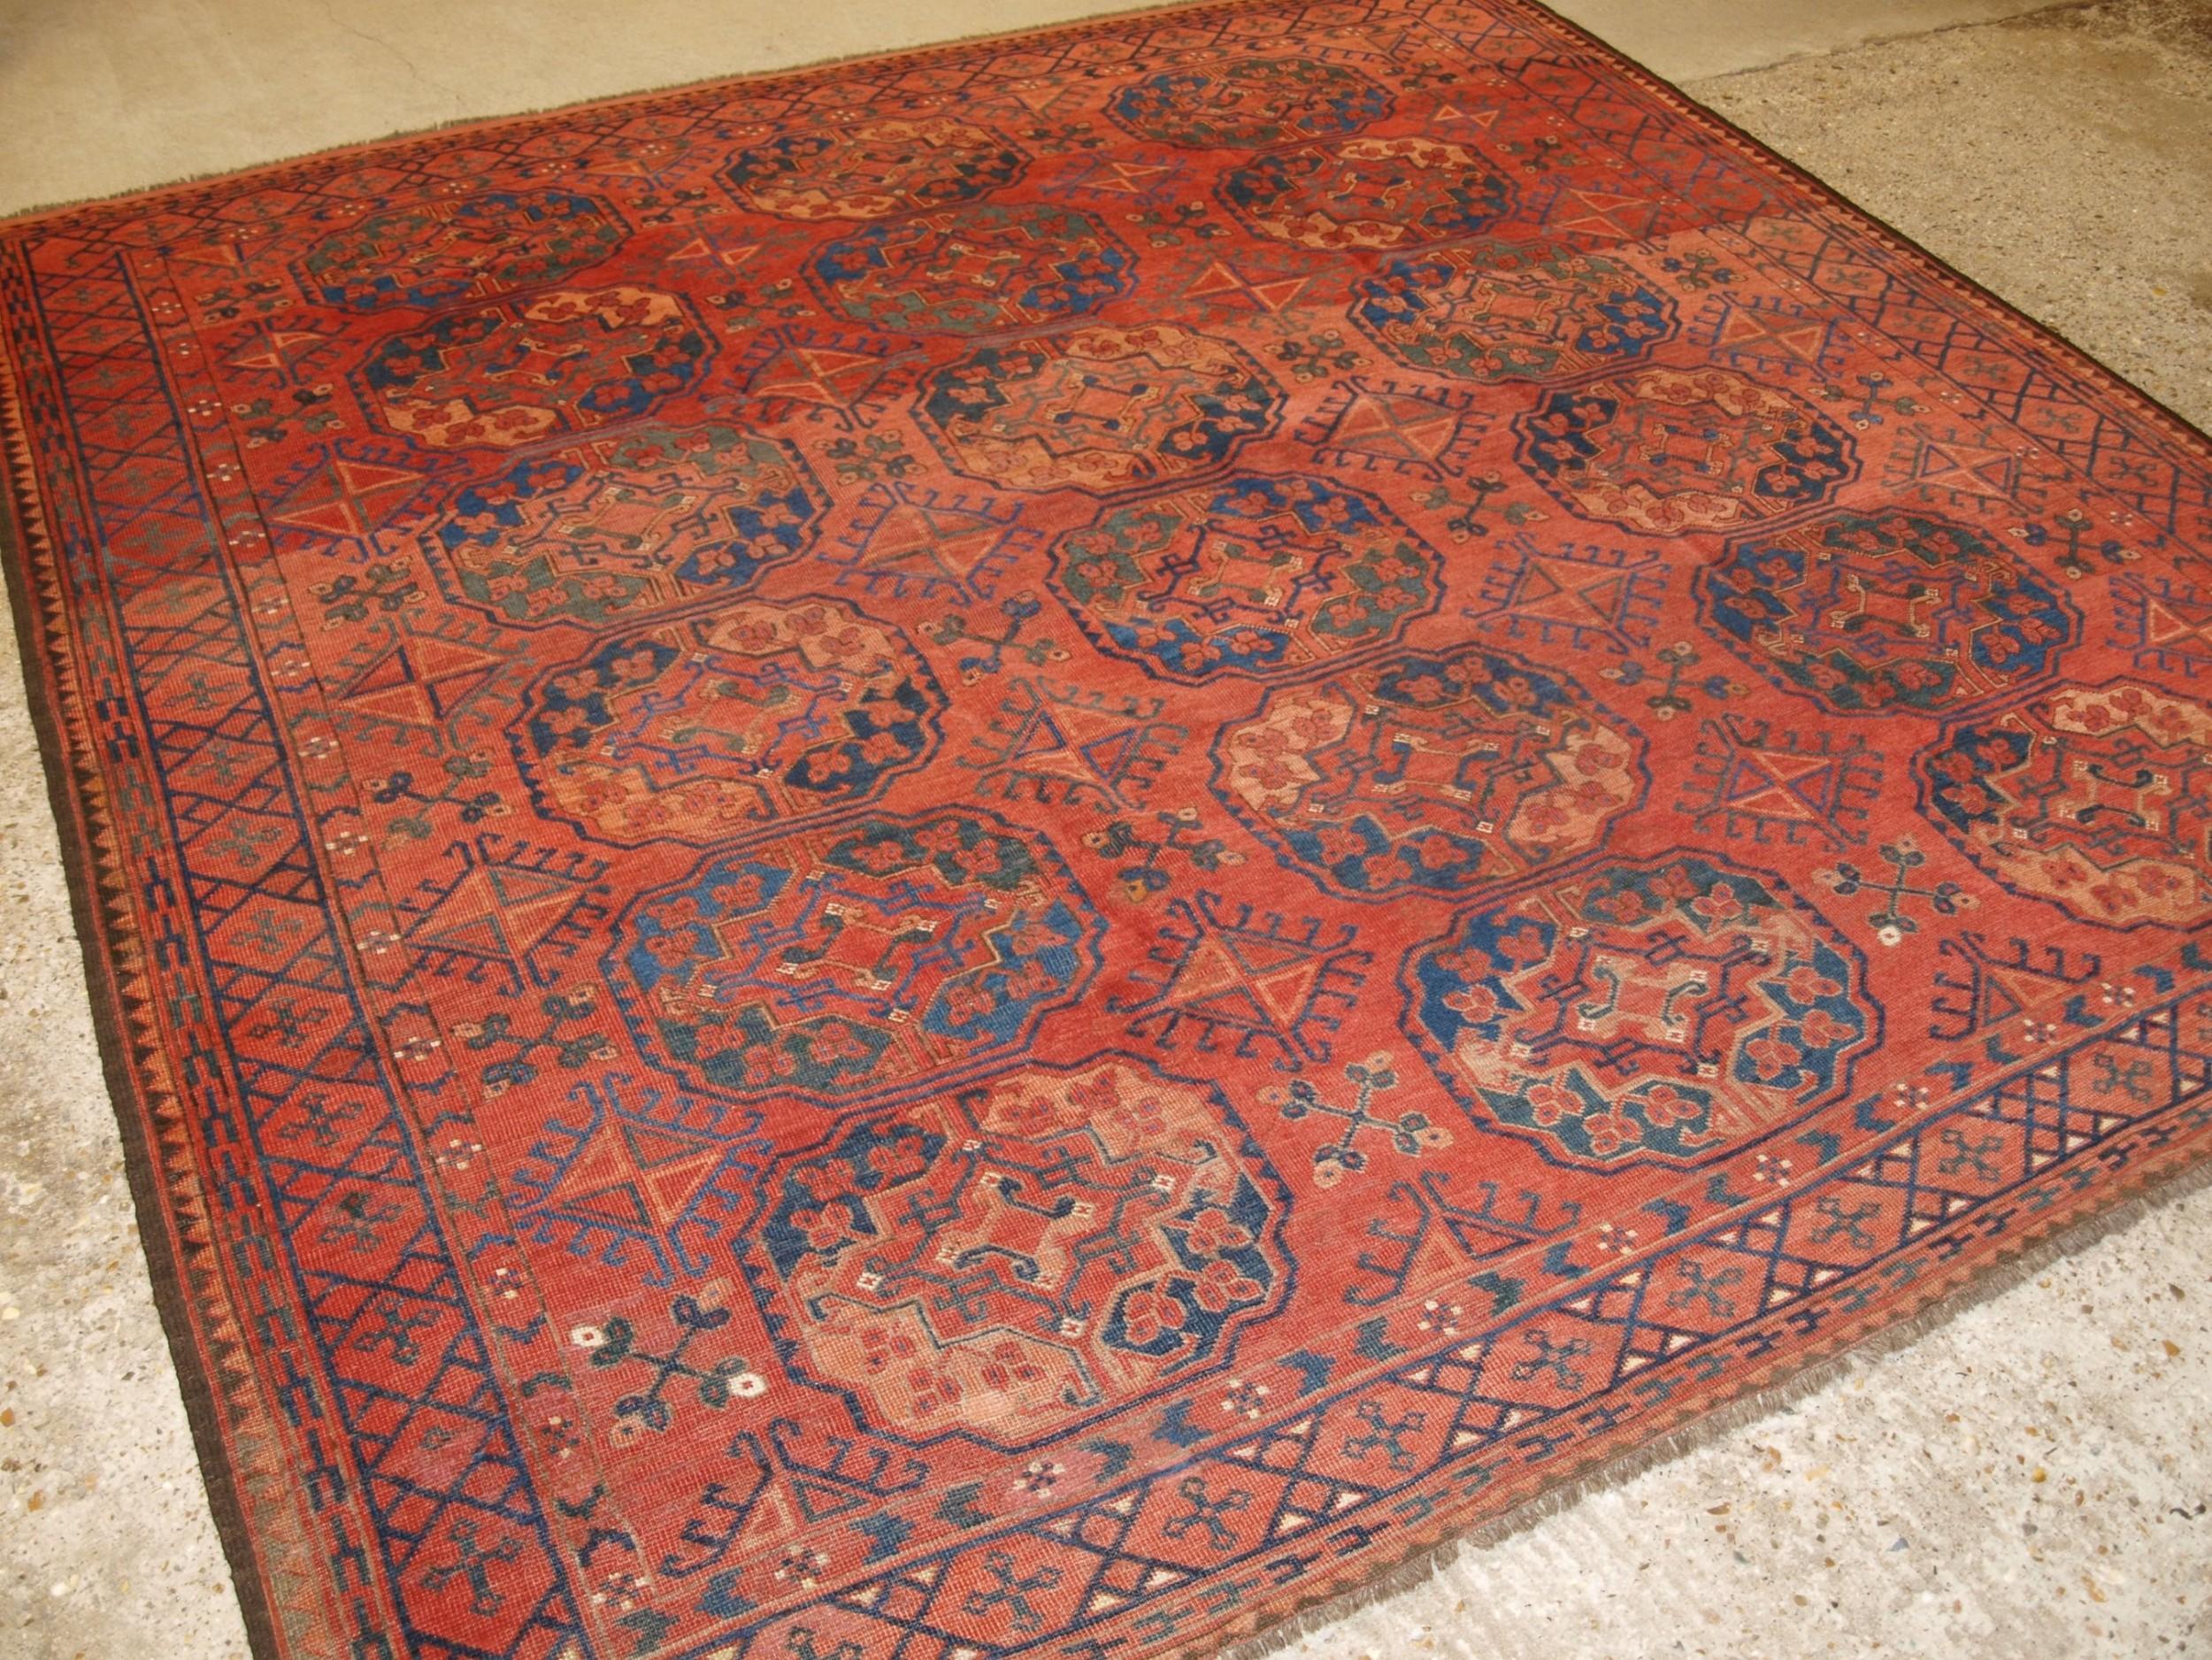 antique ersari turkmen main carpet very large guls circa 1880 or earlier